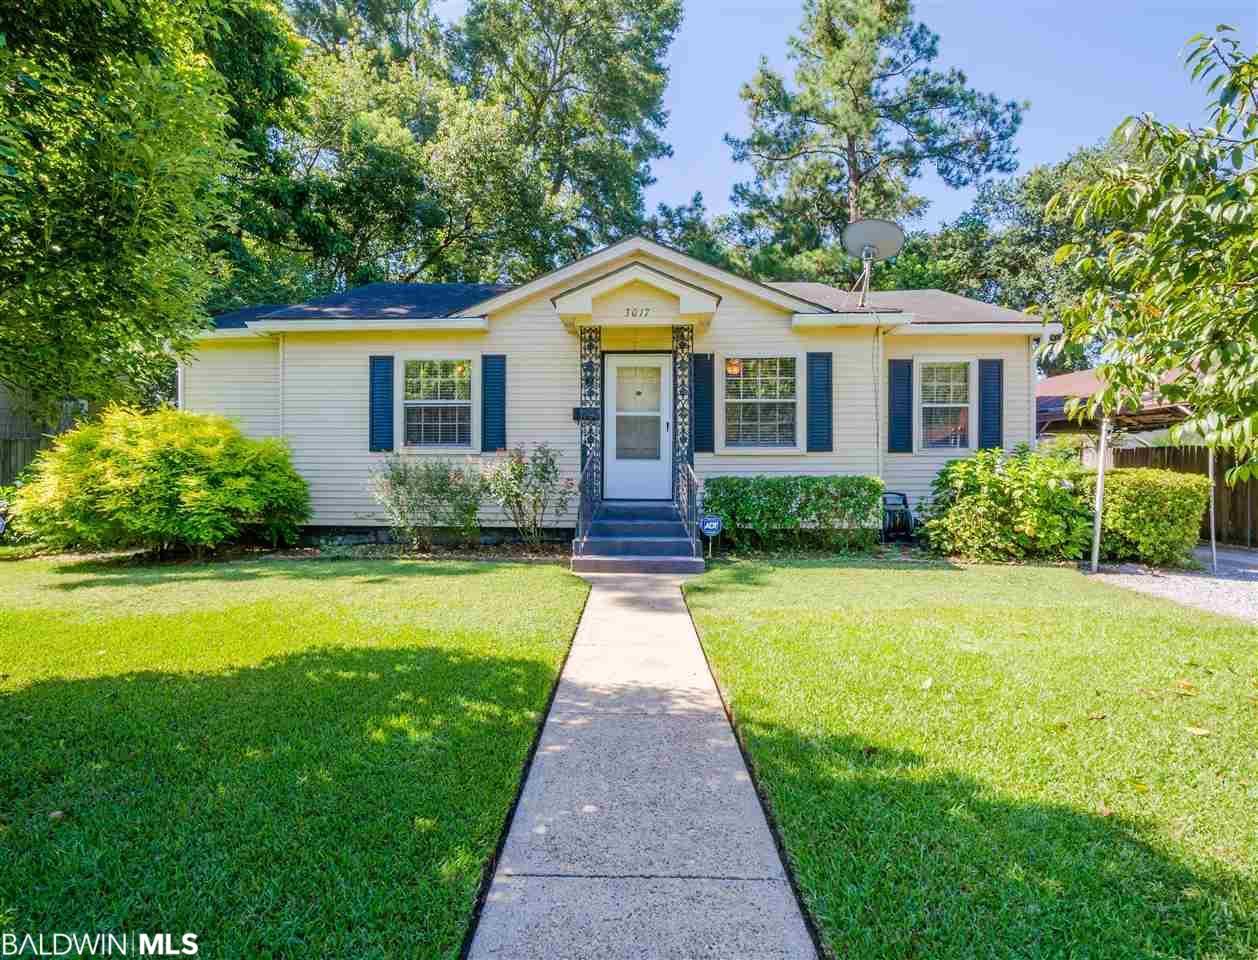 3017 Orleans St, Mobile, AL 36606